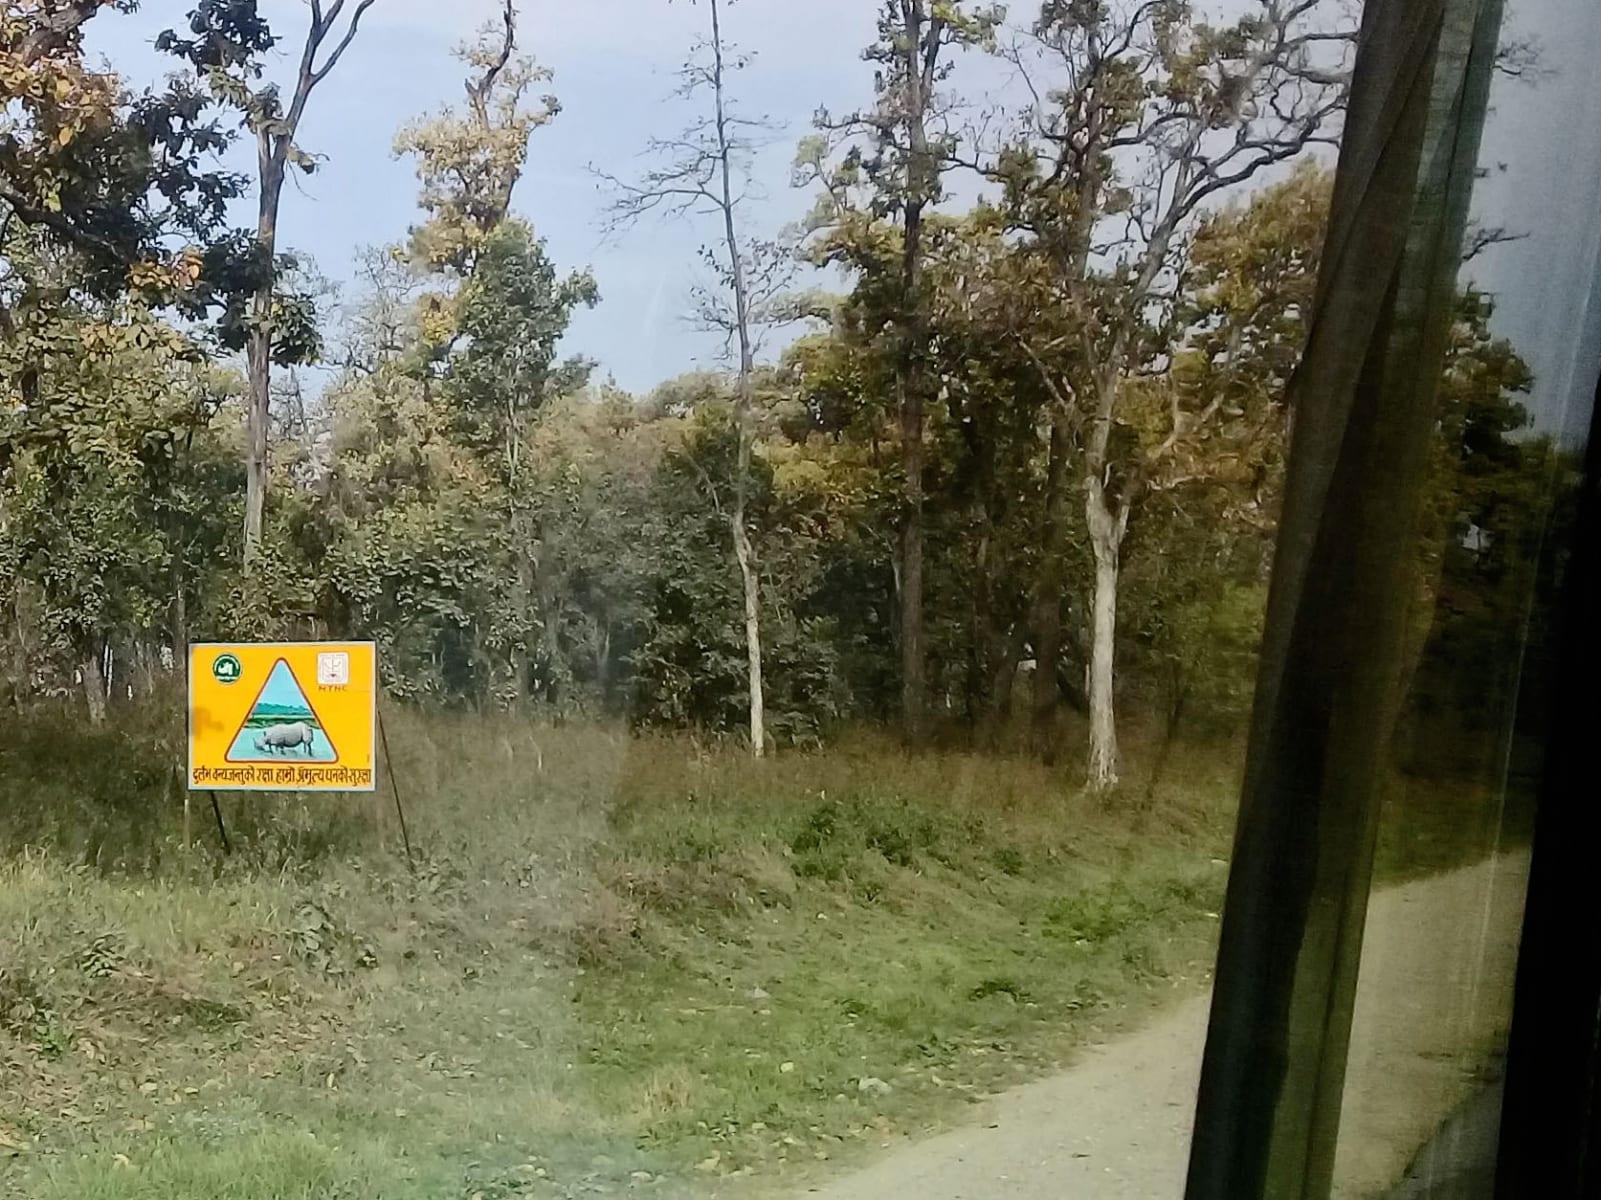 Pozor nosorožci, Suraha, Nepál